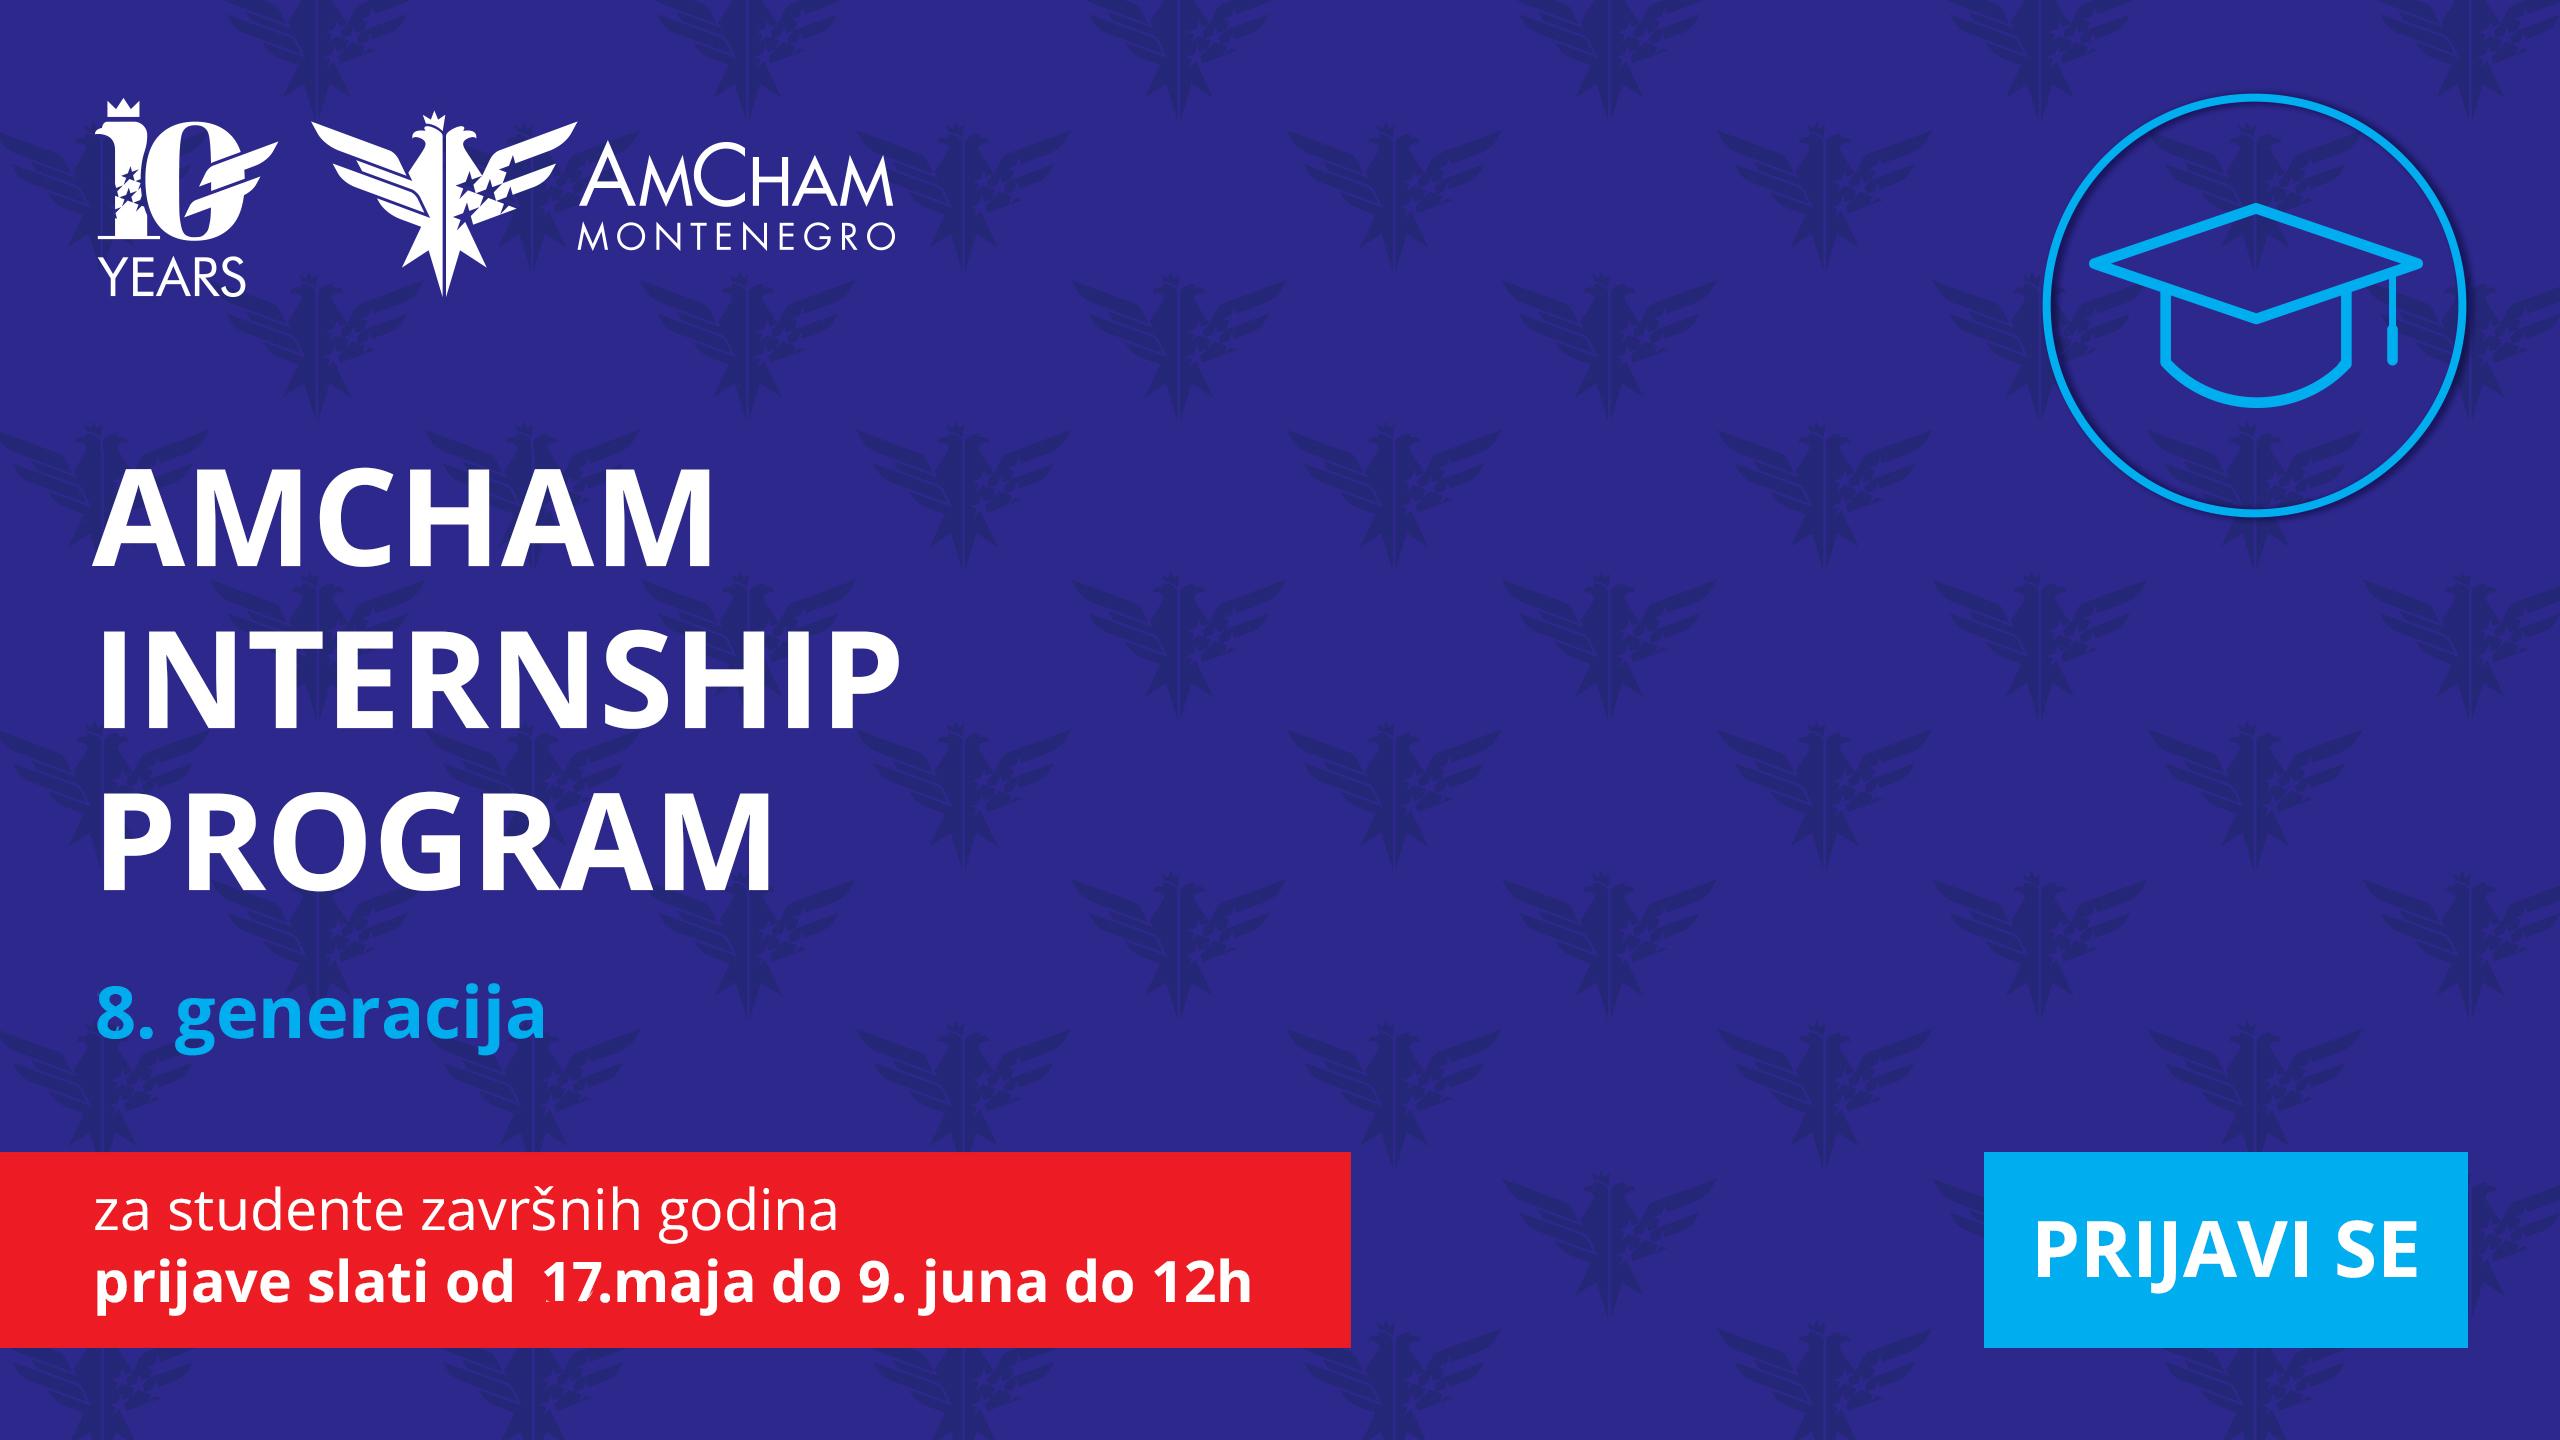 2018 AmCham Internship Program – Conditions for application and